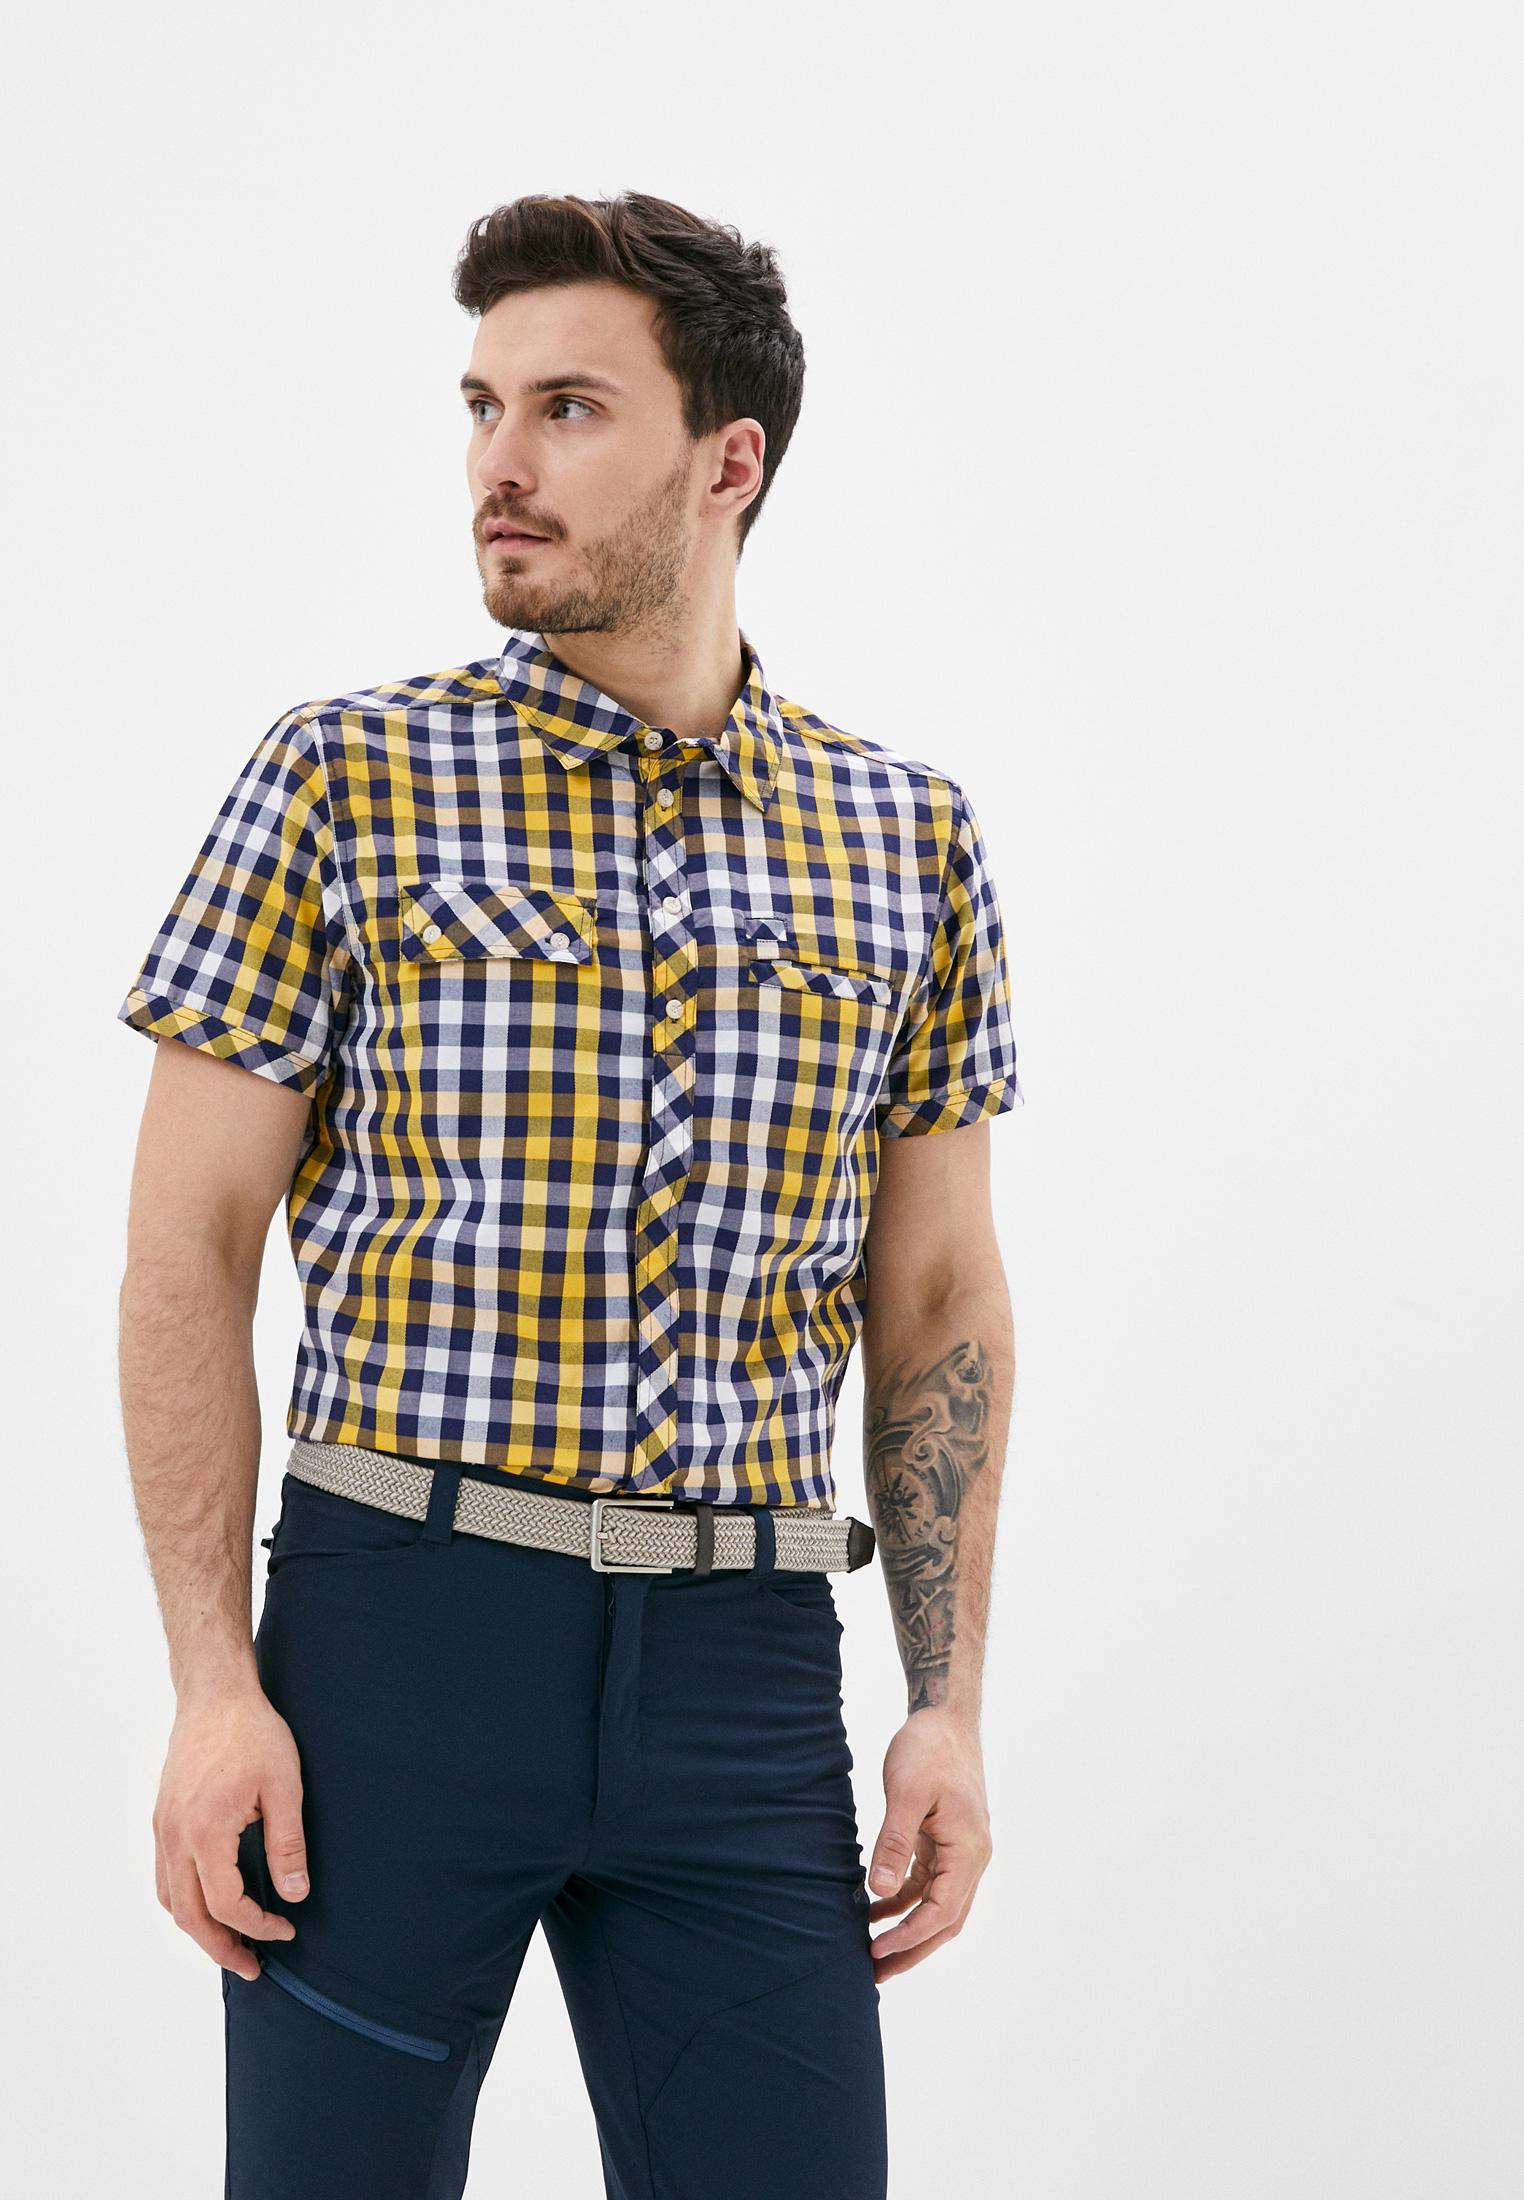 мужская рубашка цвета мята